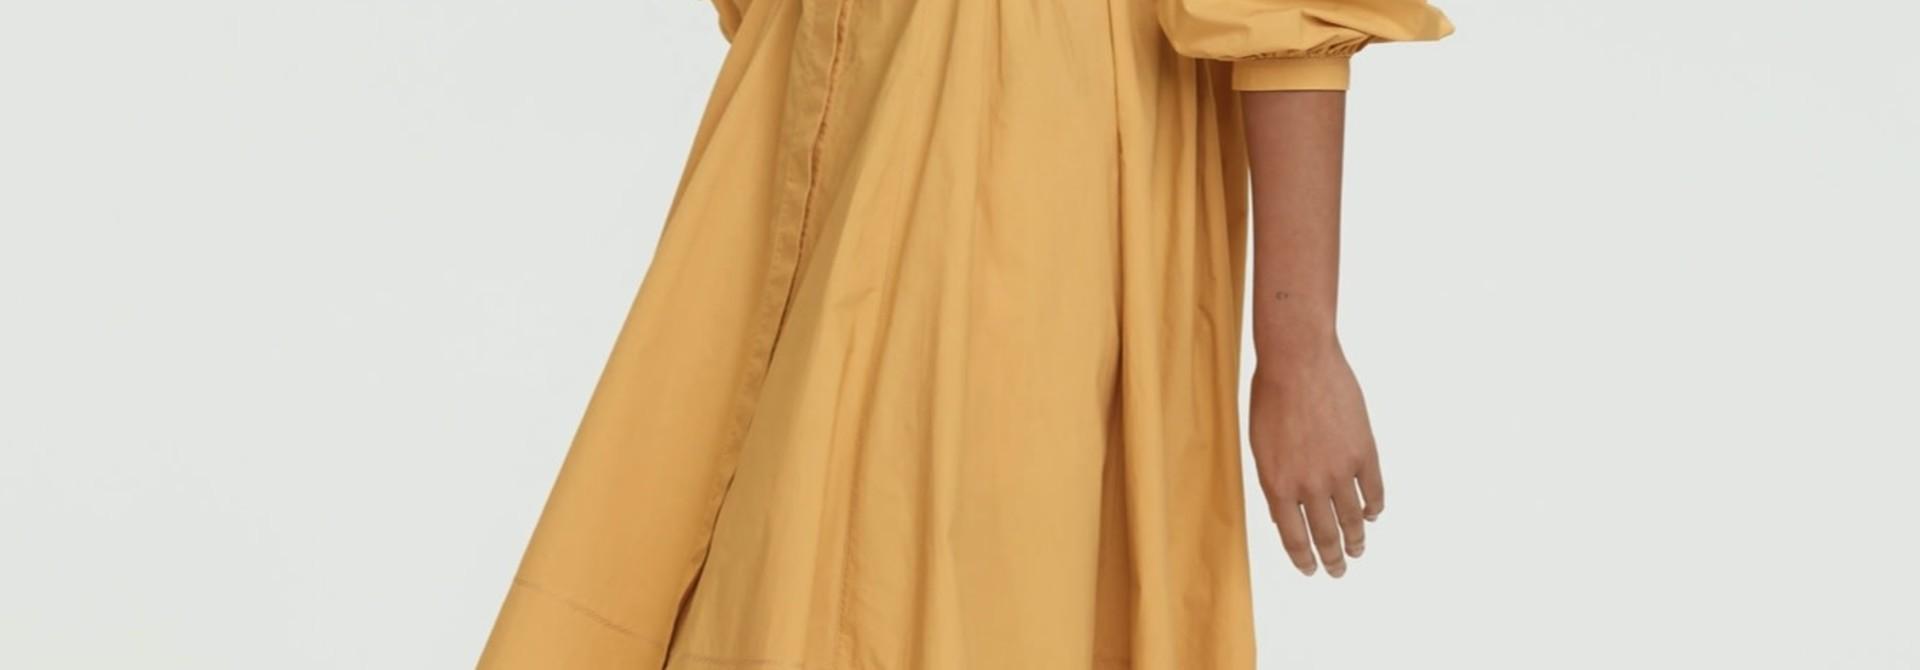 Popeline power dress Dorothee schumacher